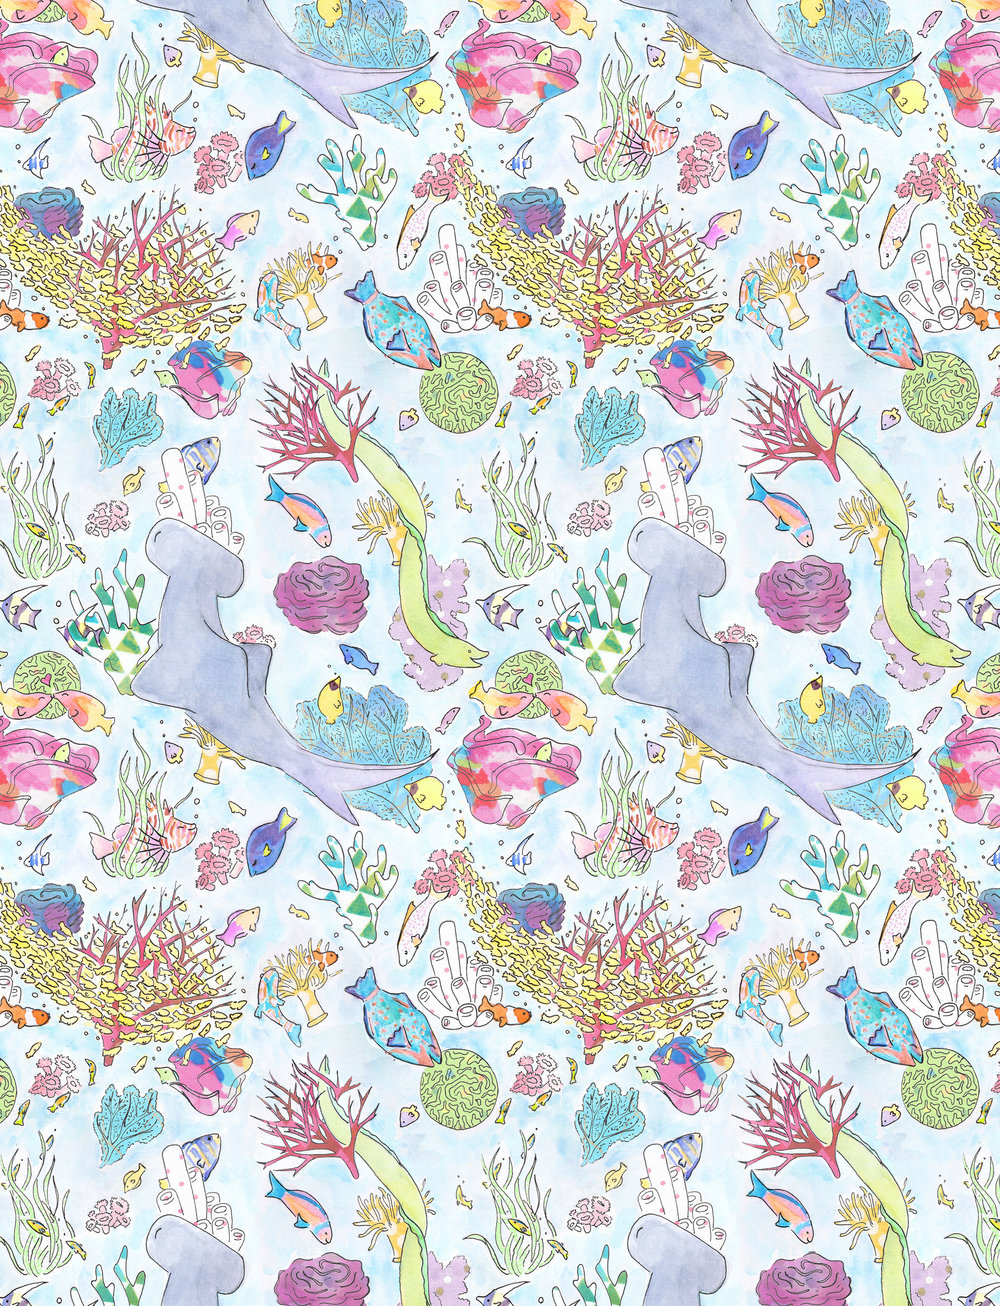 Neubauer-Joanne-Winter17-ILLU463- Berkheiser-A4-Coralful.jpg